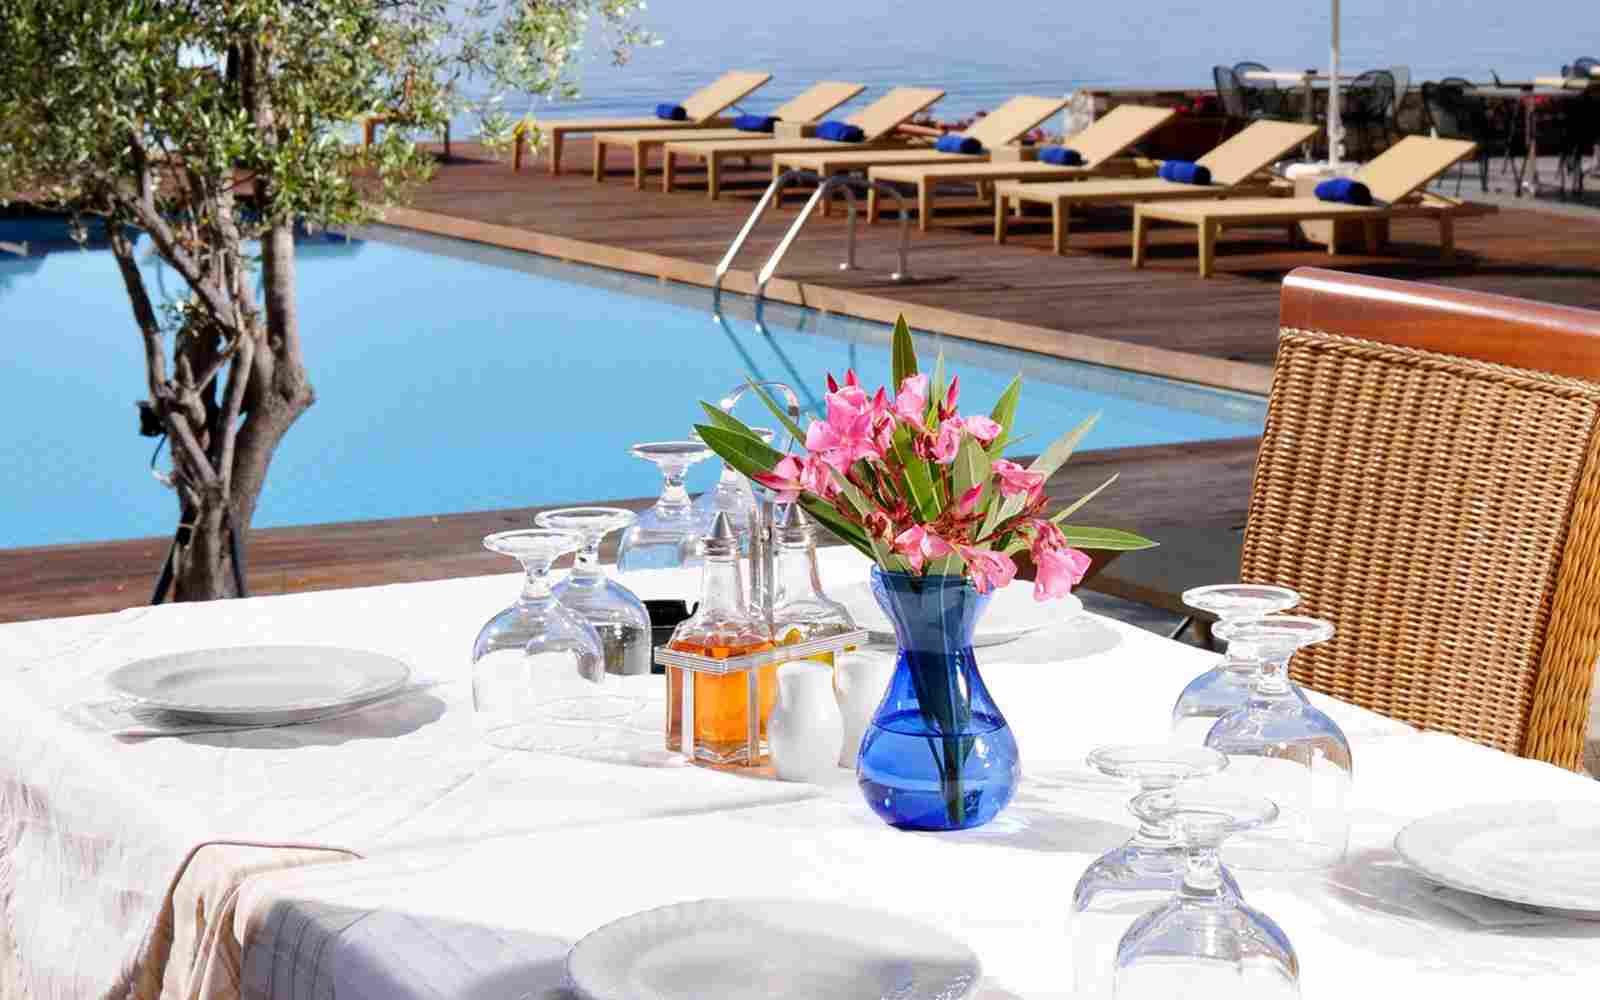 https://www.casacaribepuertomorelos.com/wp-content/uploads/2016/03/summer-hotel-09.jpg